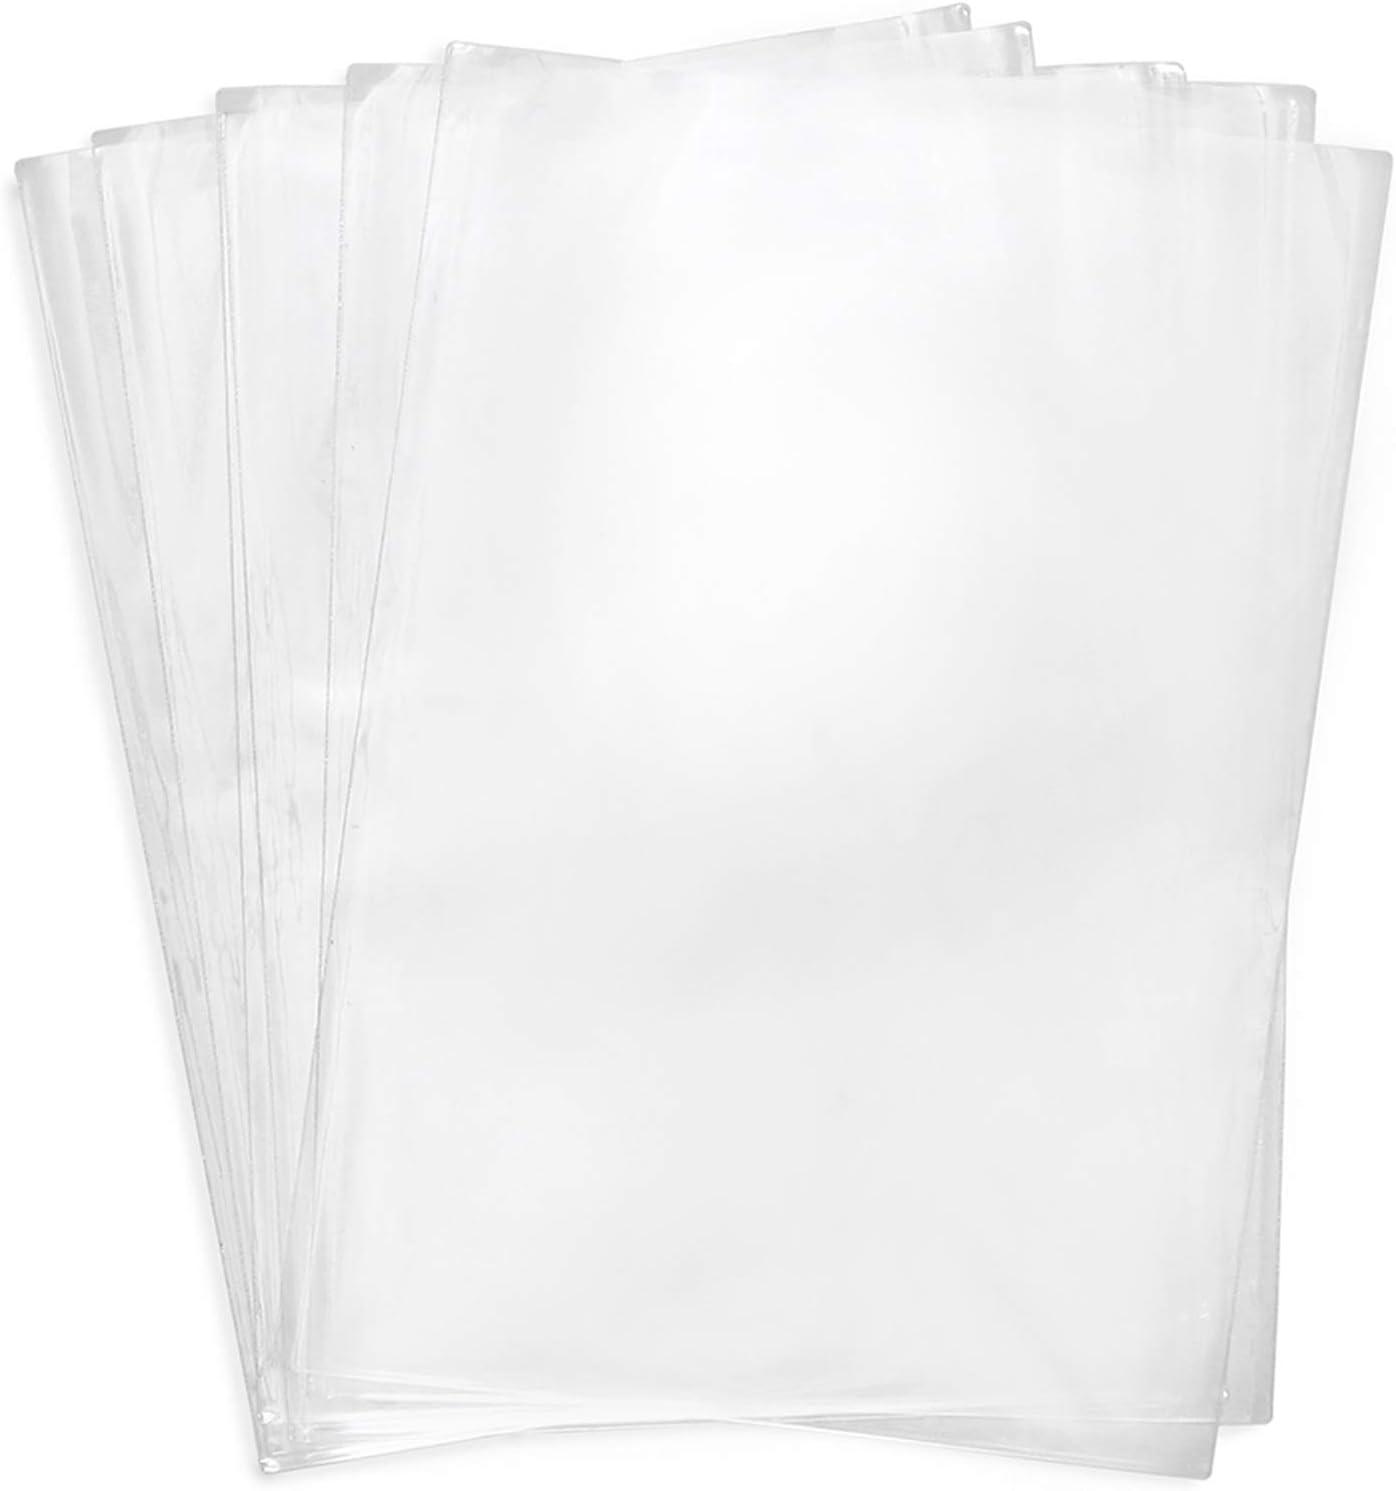 Shrink Wrap Bags,100 Pcs 14x20 Inches Clear PVC Heat Shrink Wrap